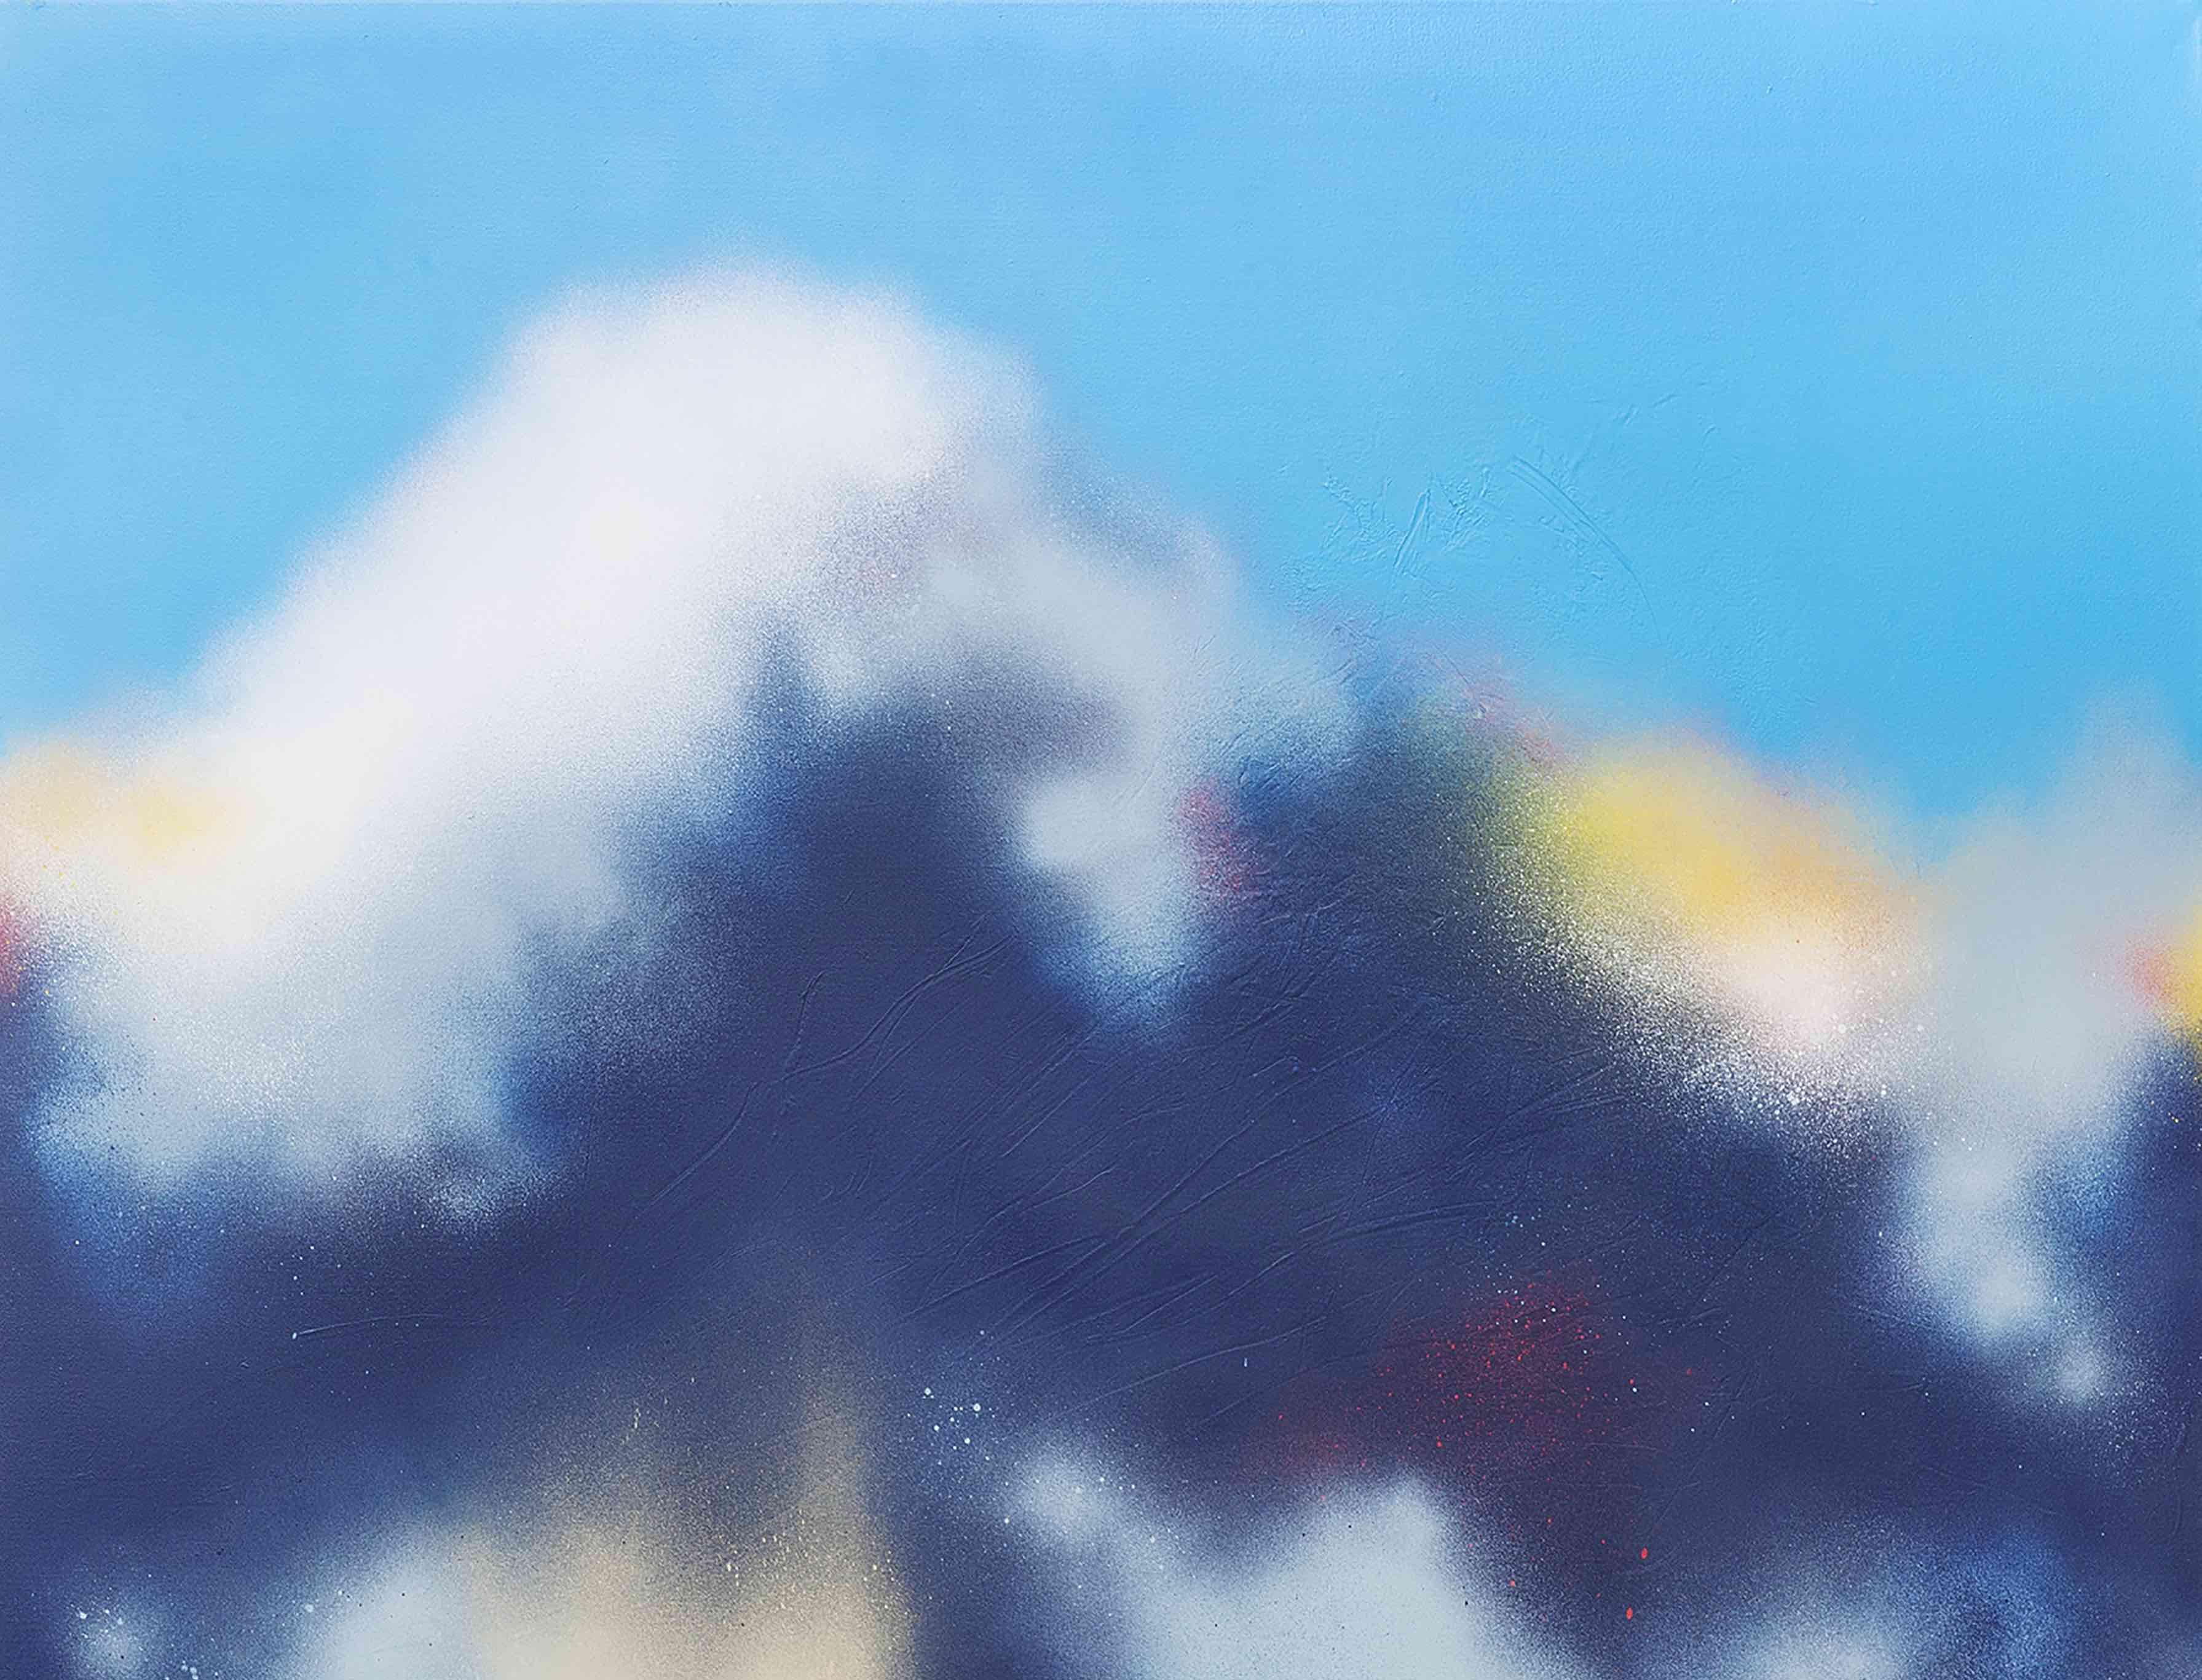 FIRST DOWN代表作に手描きの山をデザイン BEAMSからコラボアイテム発売